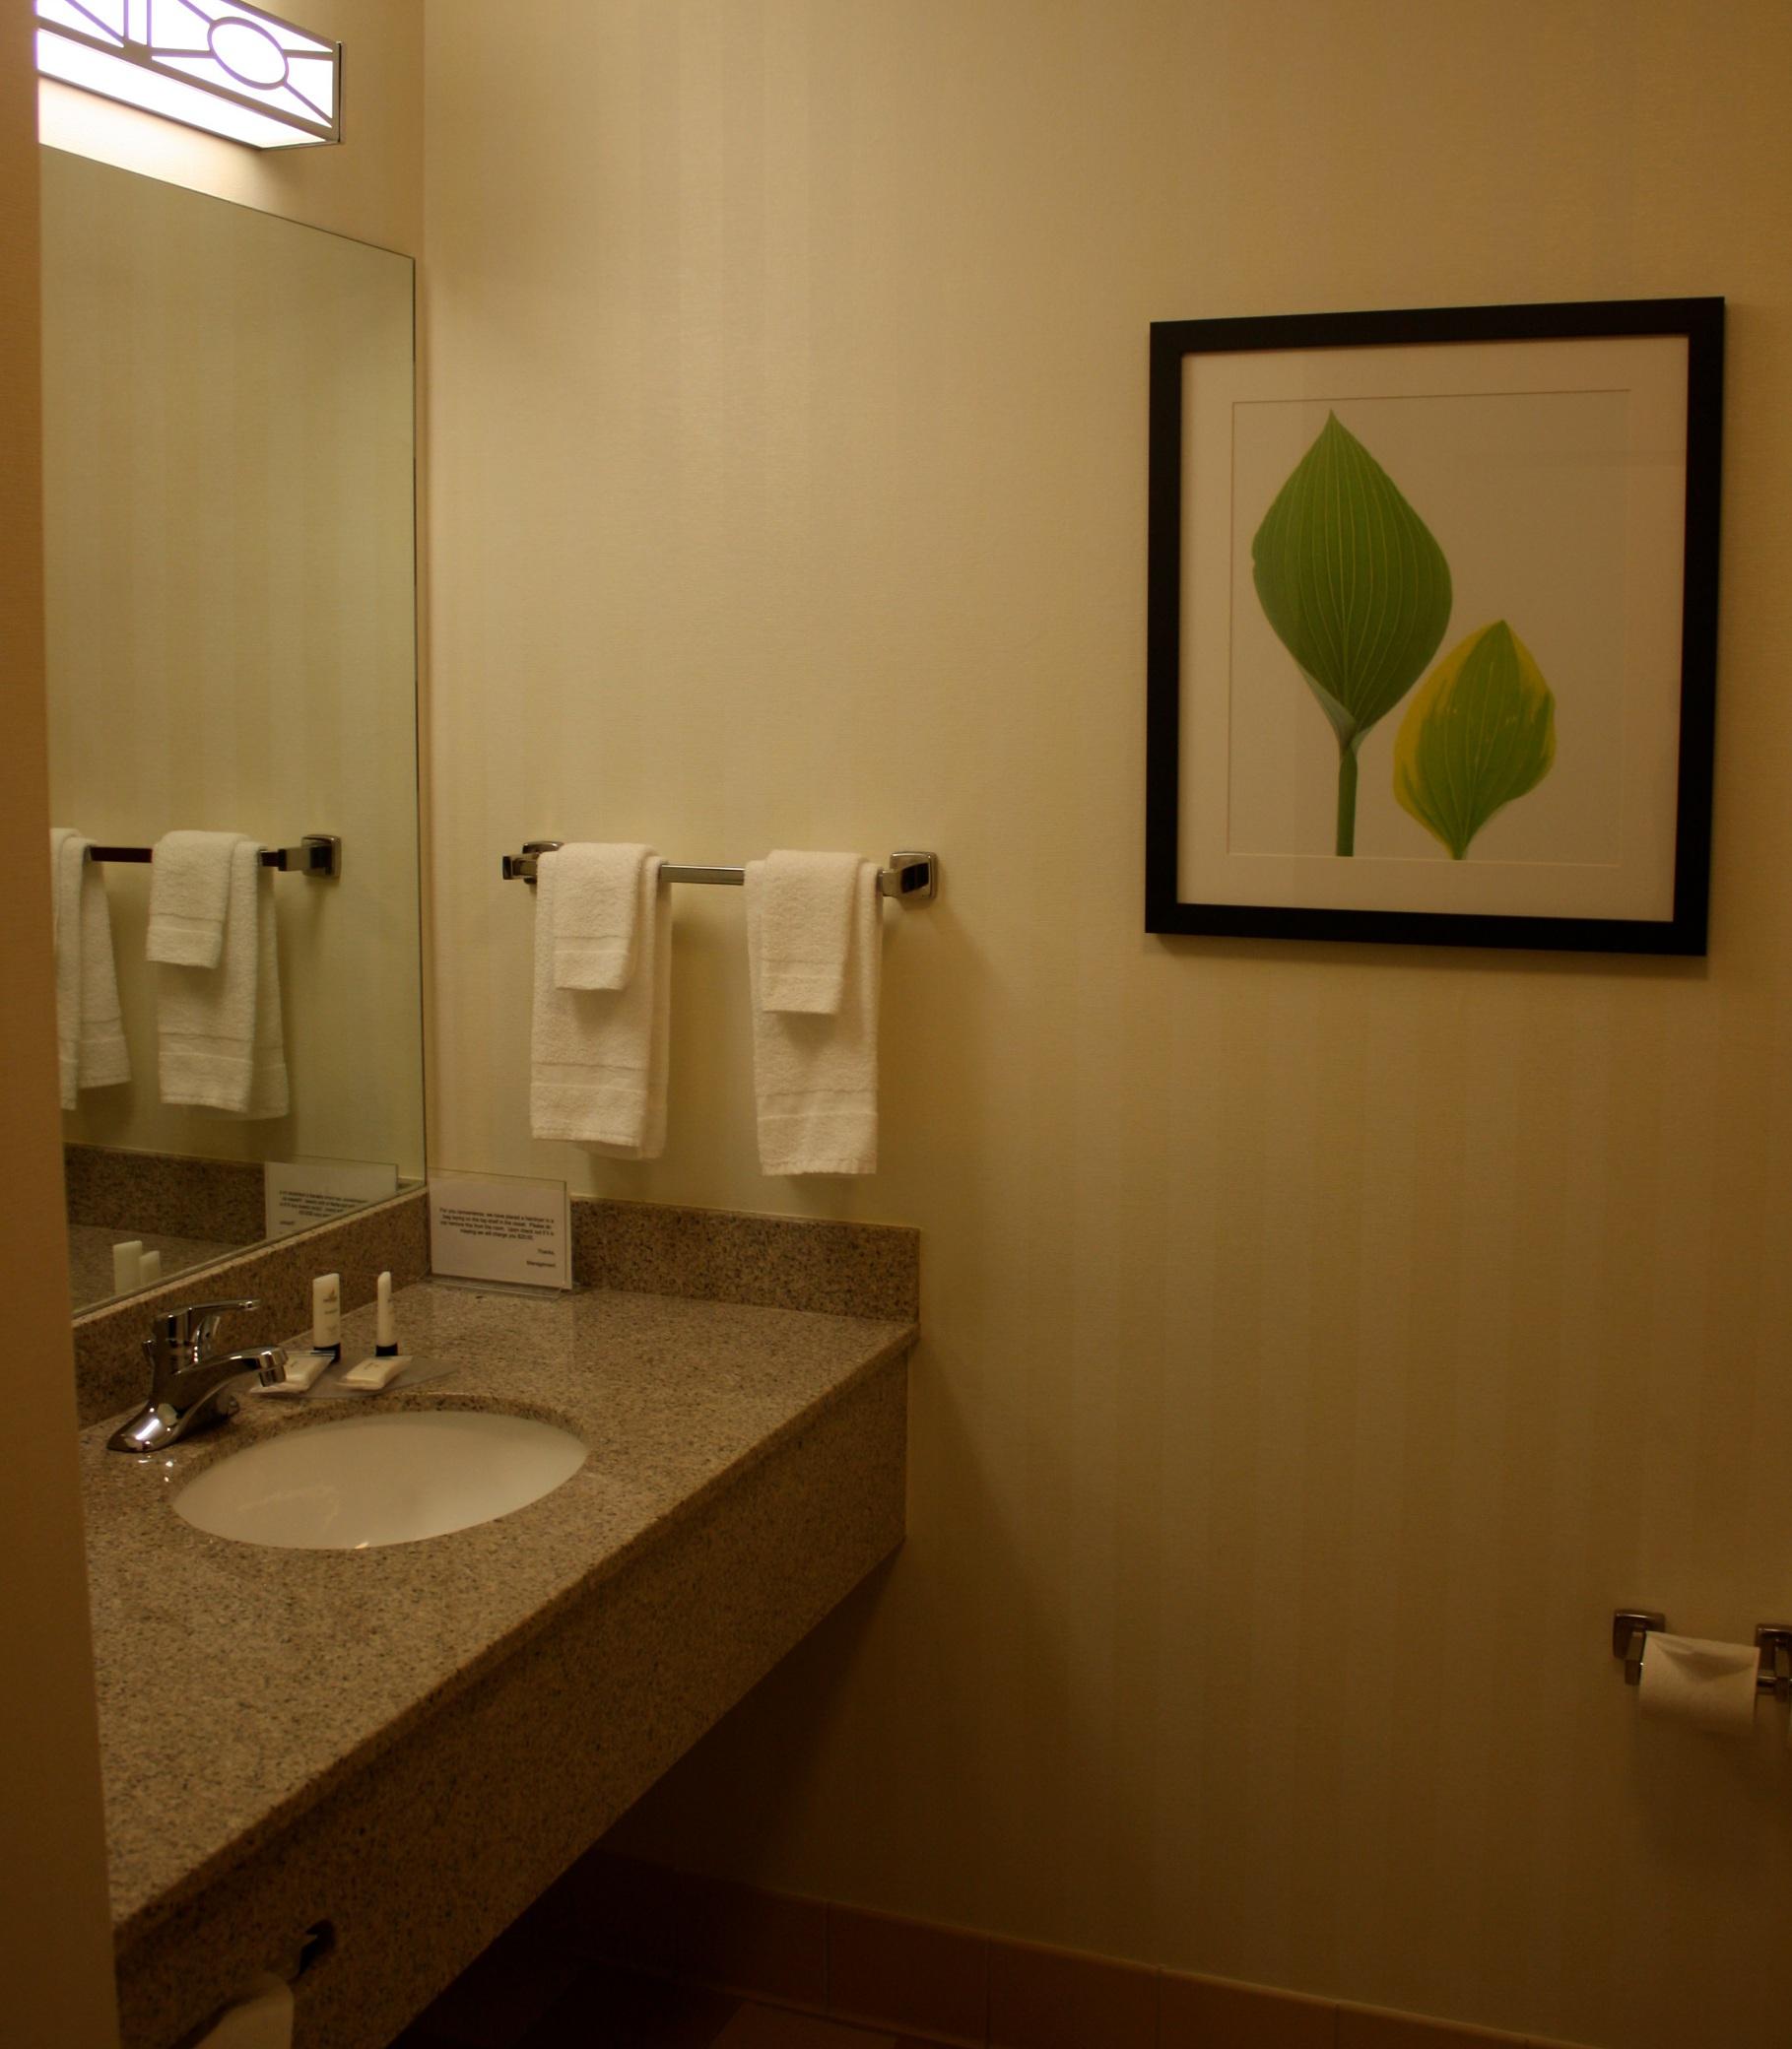 Fairfield Inn & Suites by Marriott Bentonville Rogers image 8